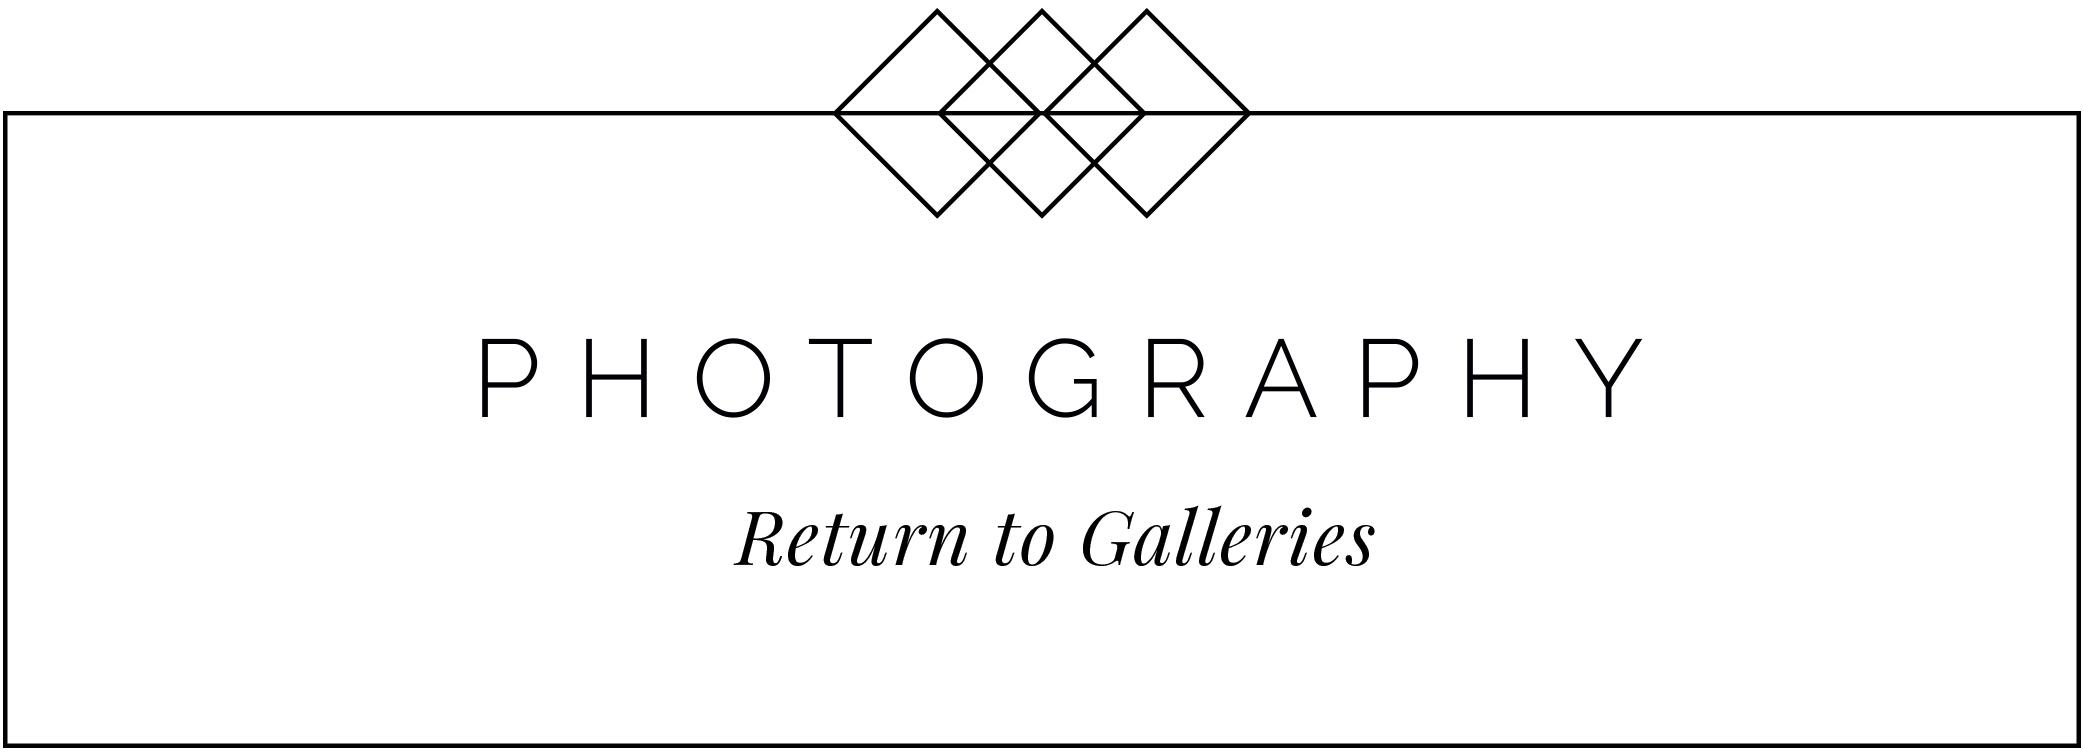 photographygallerybutton_return.jpg